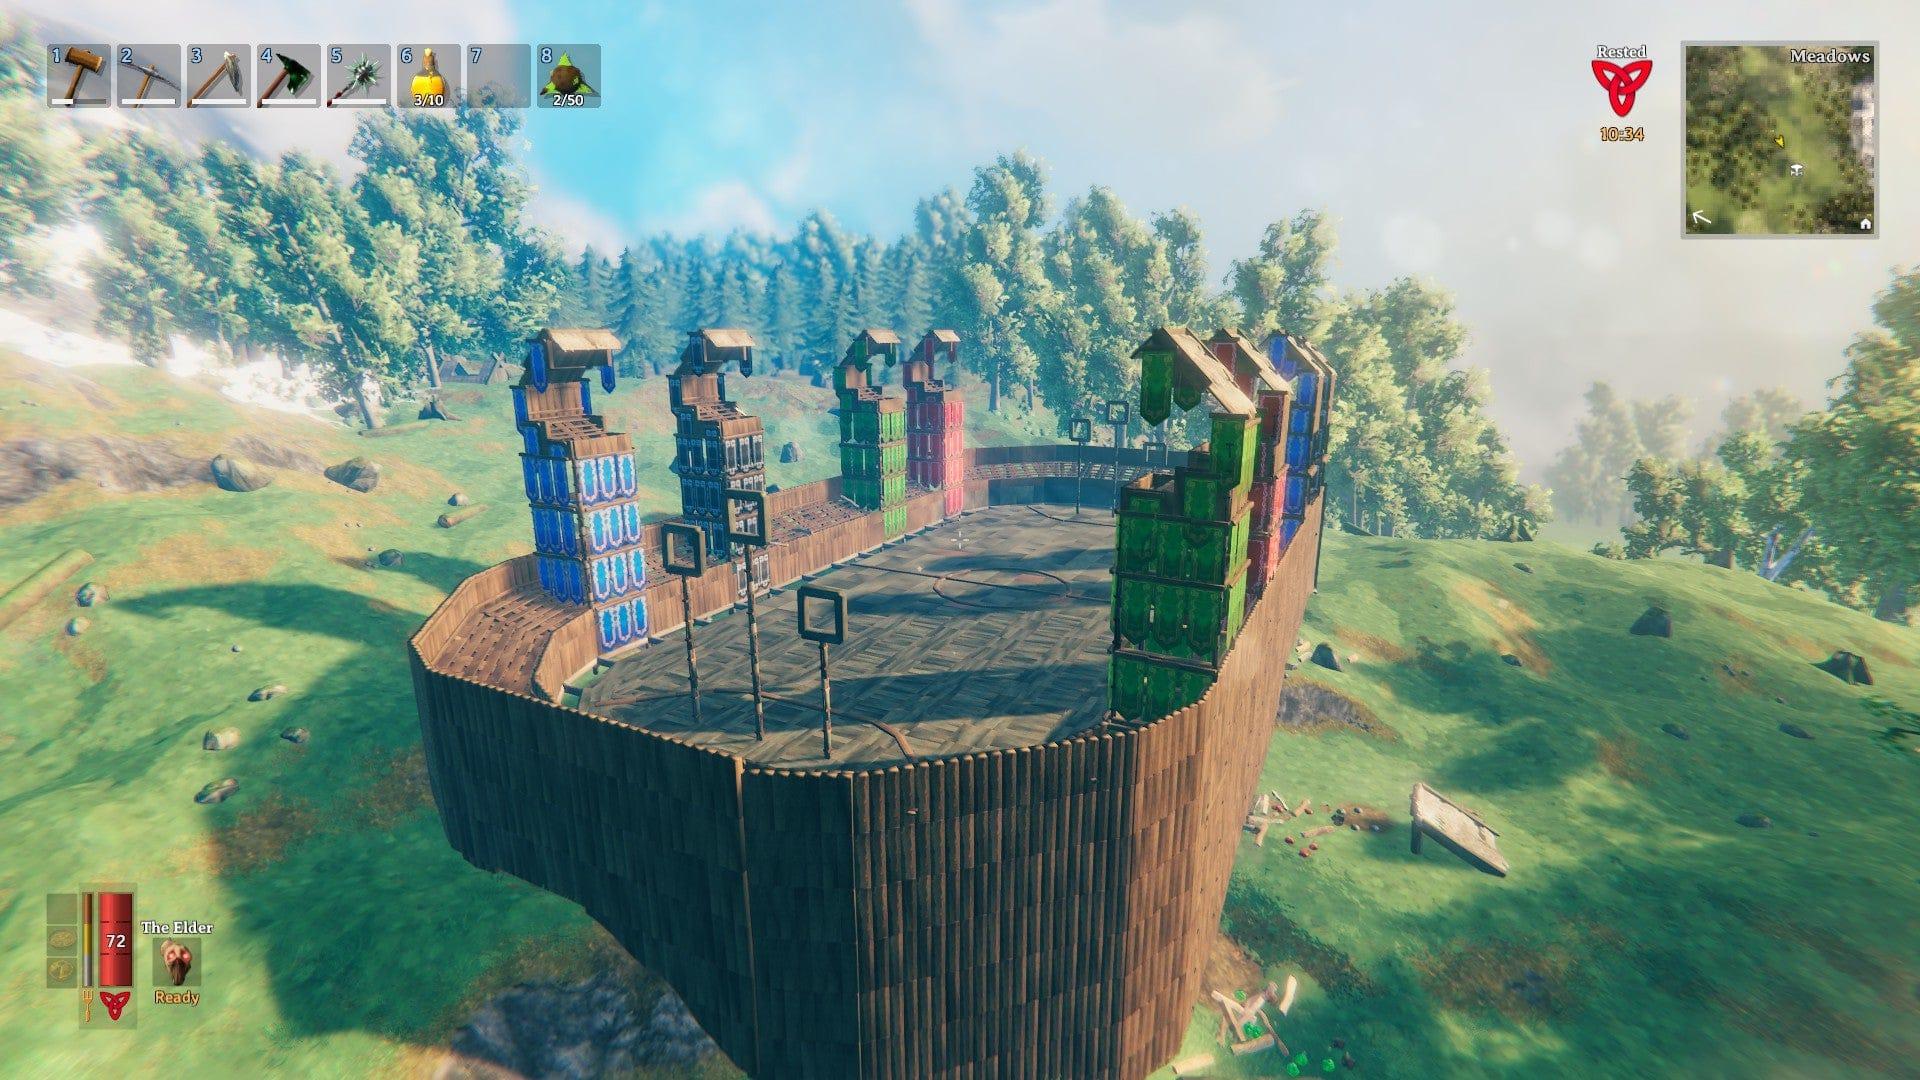 La Hogwarts di Harry Potter ricostruita nel videogioco Valheim thumbnail